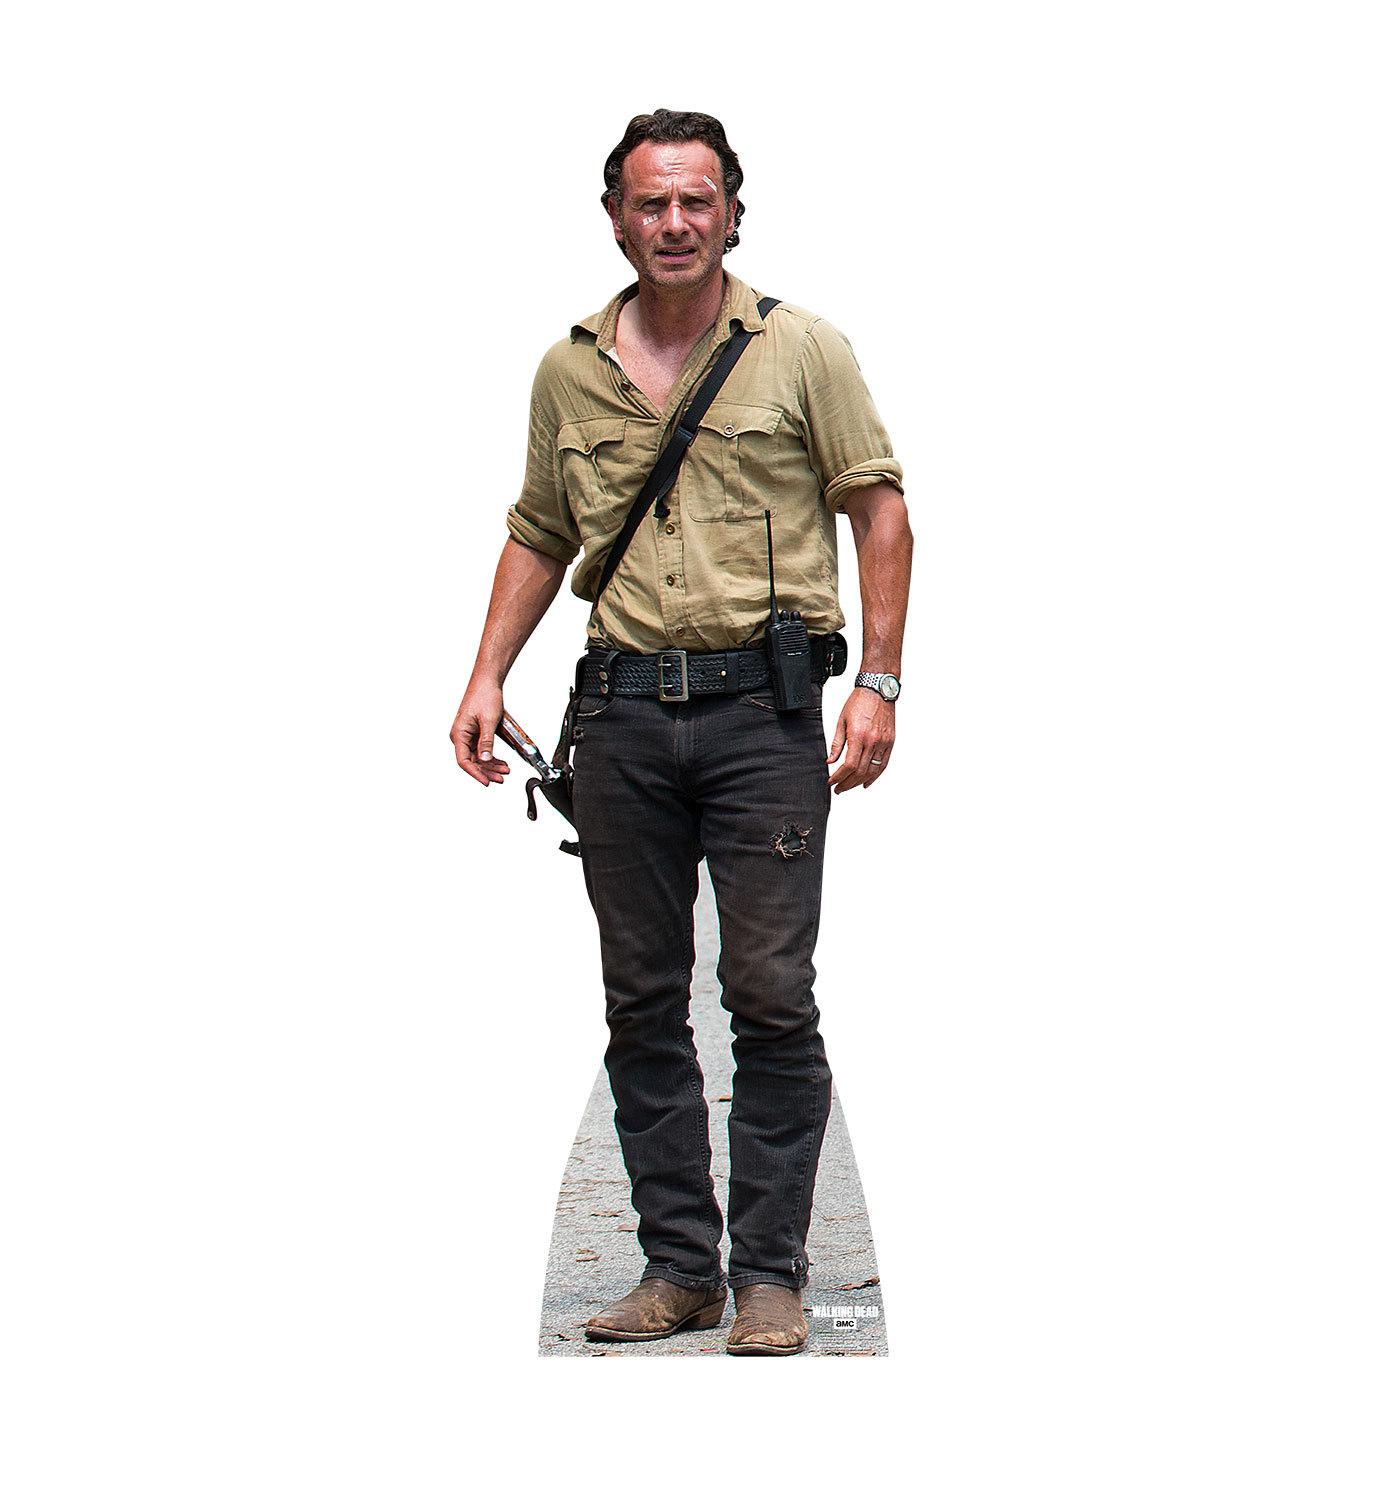 RICK GRIMES WALKING DEAD LIFESIZE CARDBOARD STANDUP STANDEE CUTOUT 2236 - $39.95